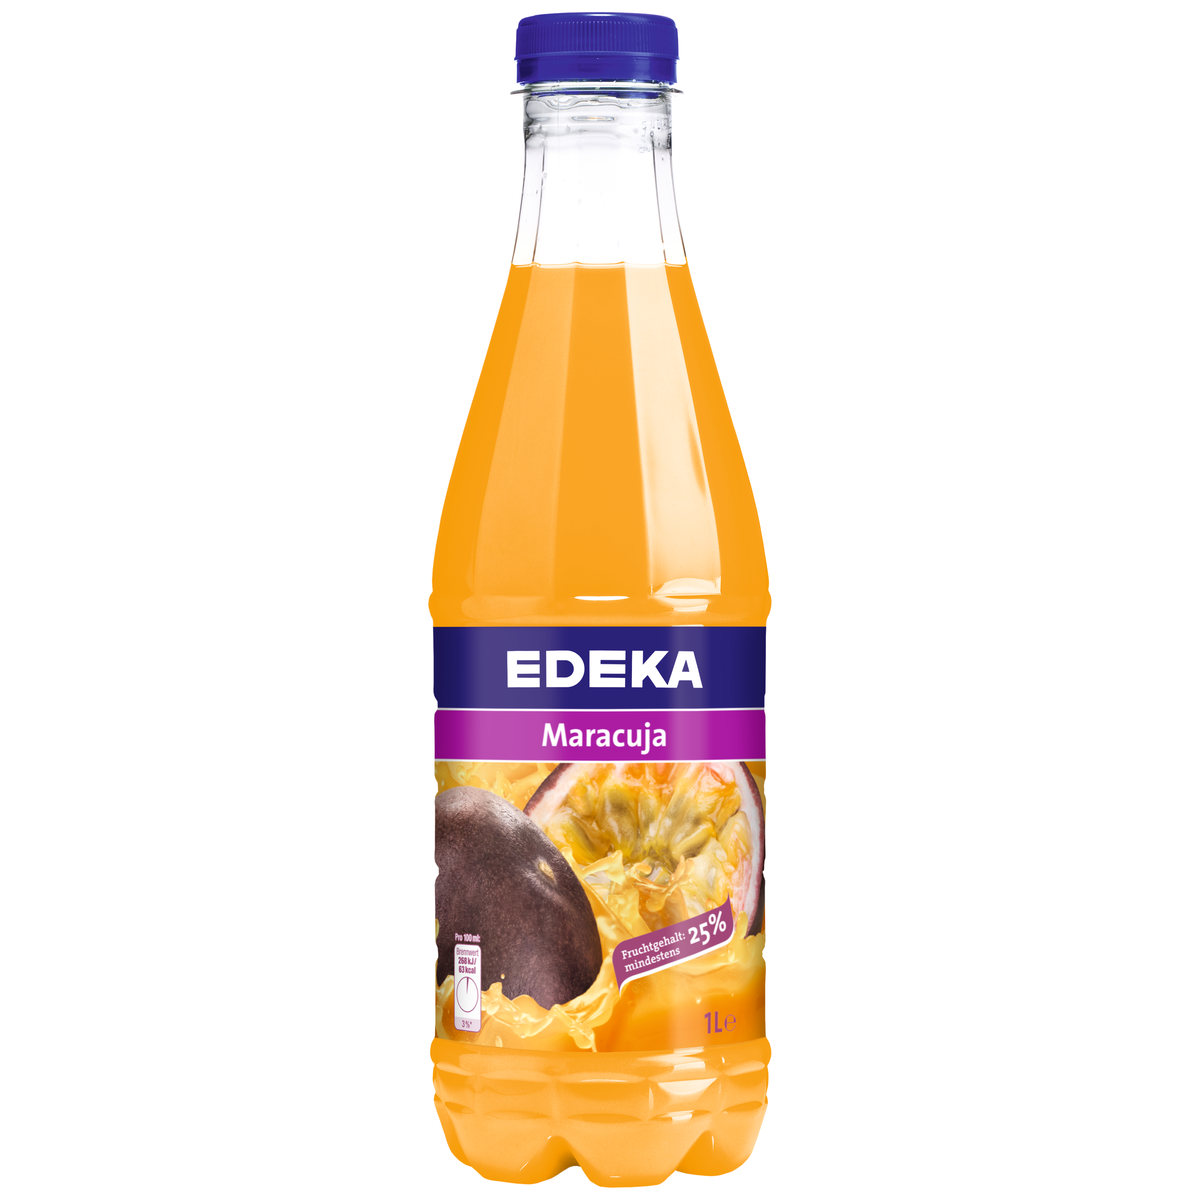 EDEKA Maracuja-Nektar 1L | Säfte & Nektar | Alkoholfreie Getränke ...